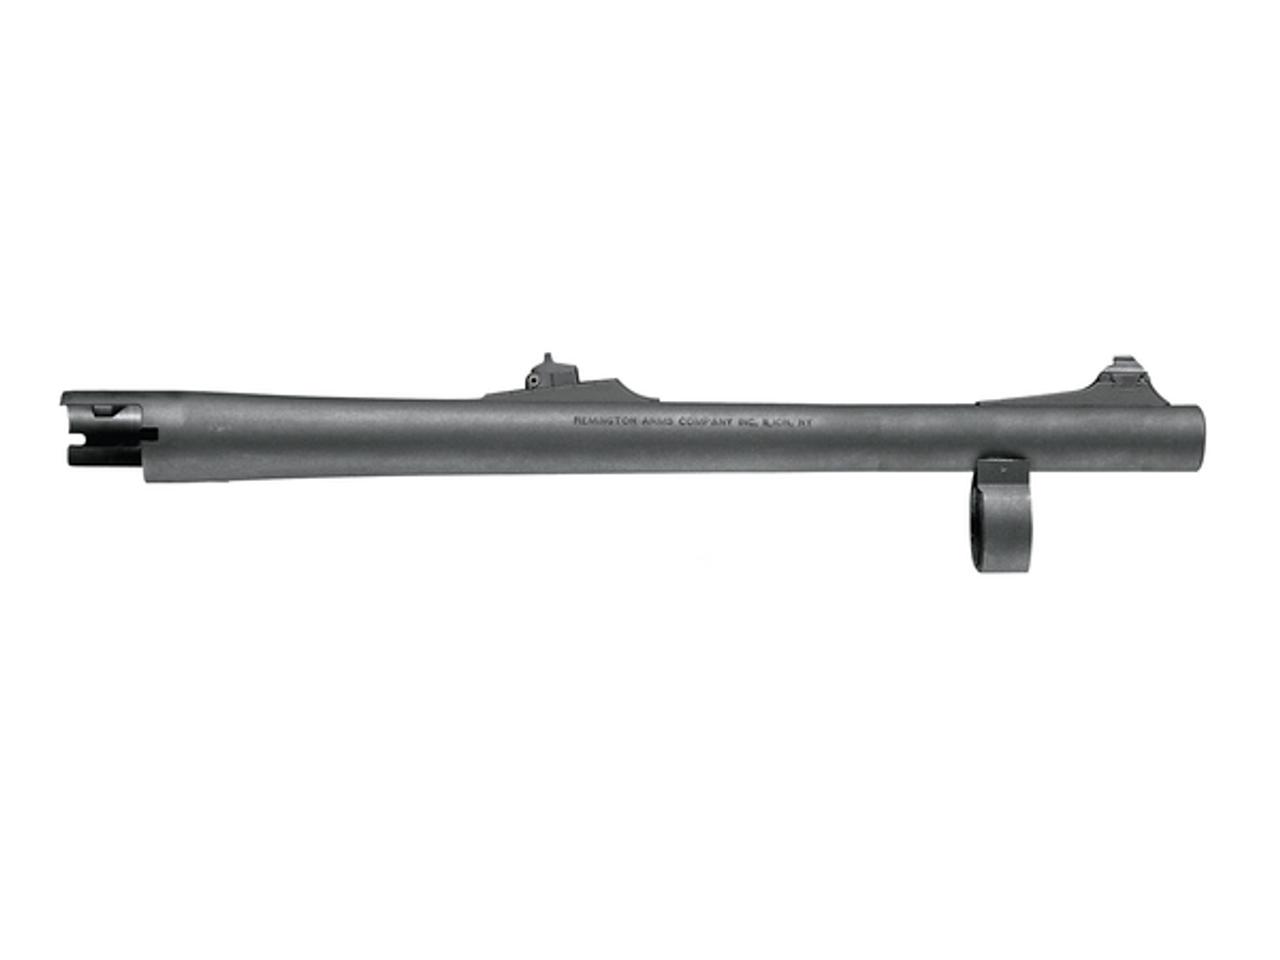 "Remington Police Barrel, 14"" Rifle Sights"